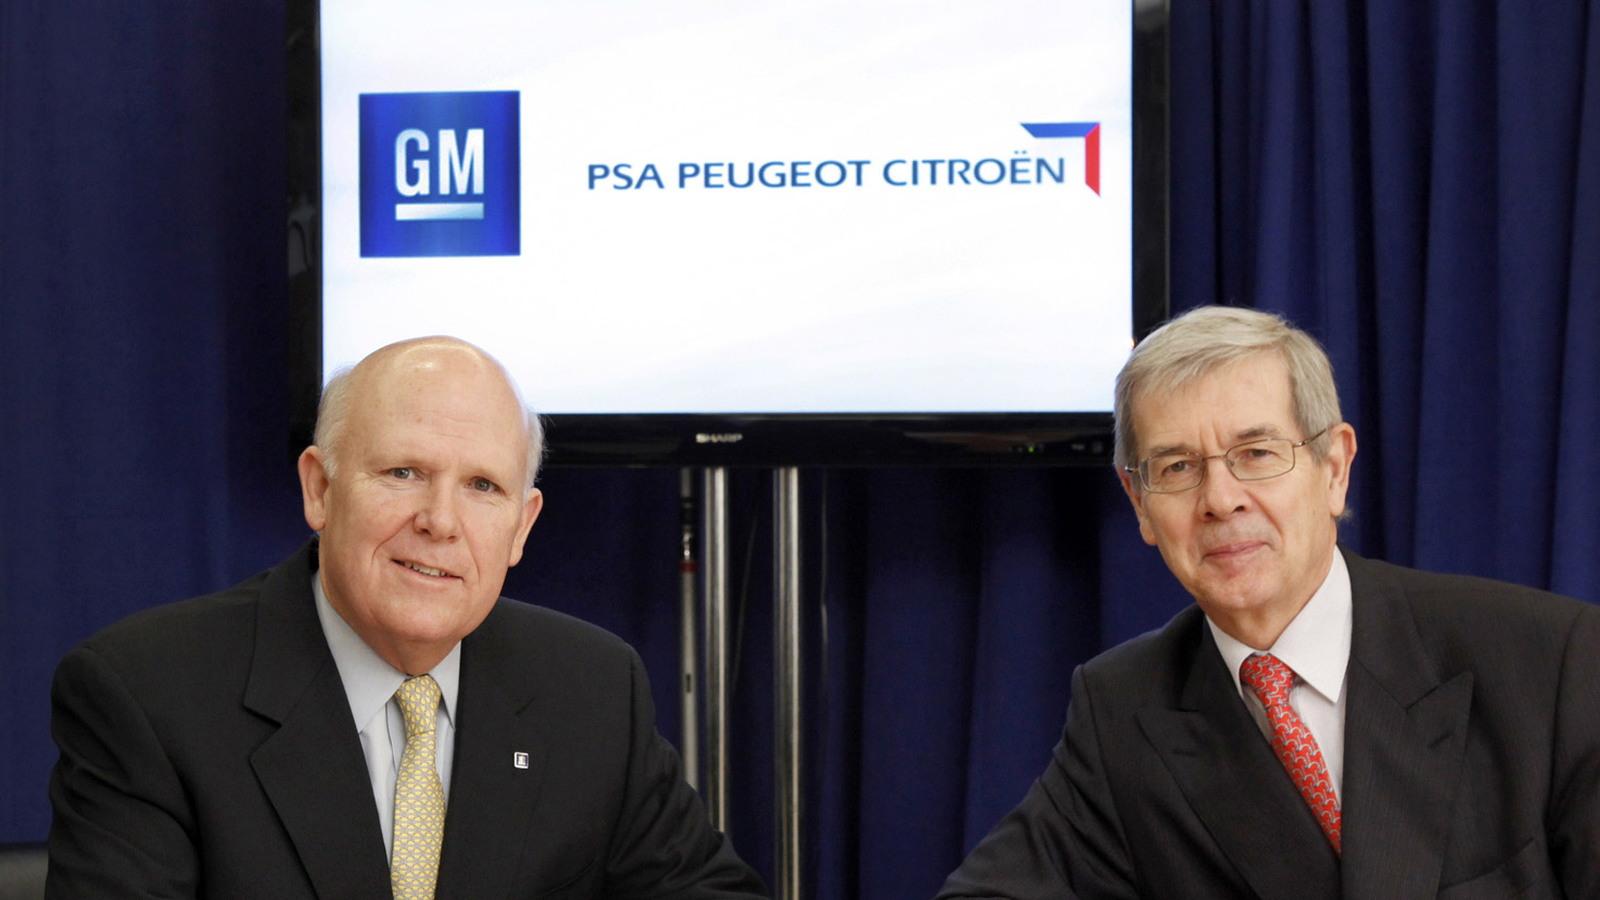 GM CEO Dan Akerson (left) and PSA Peugeot Citroen CEO Philippe Varin